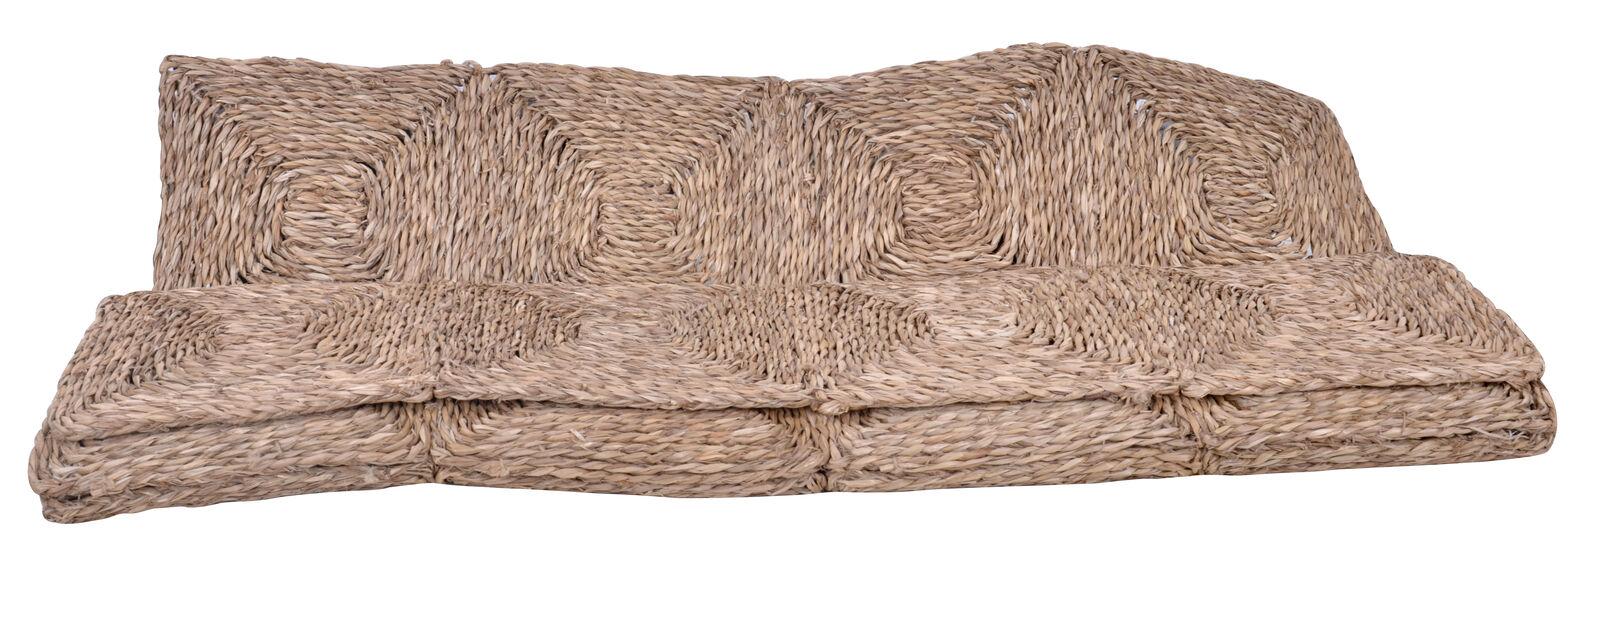 Sjögräsmatta 180x120 cm, beige